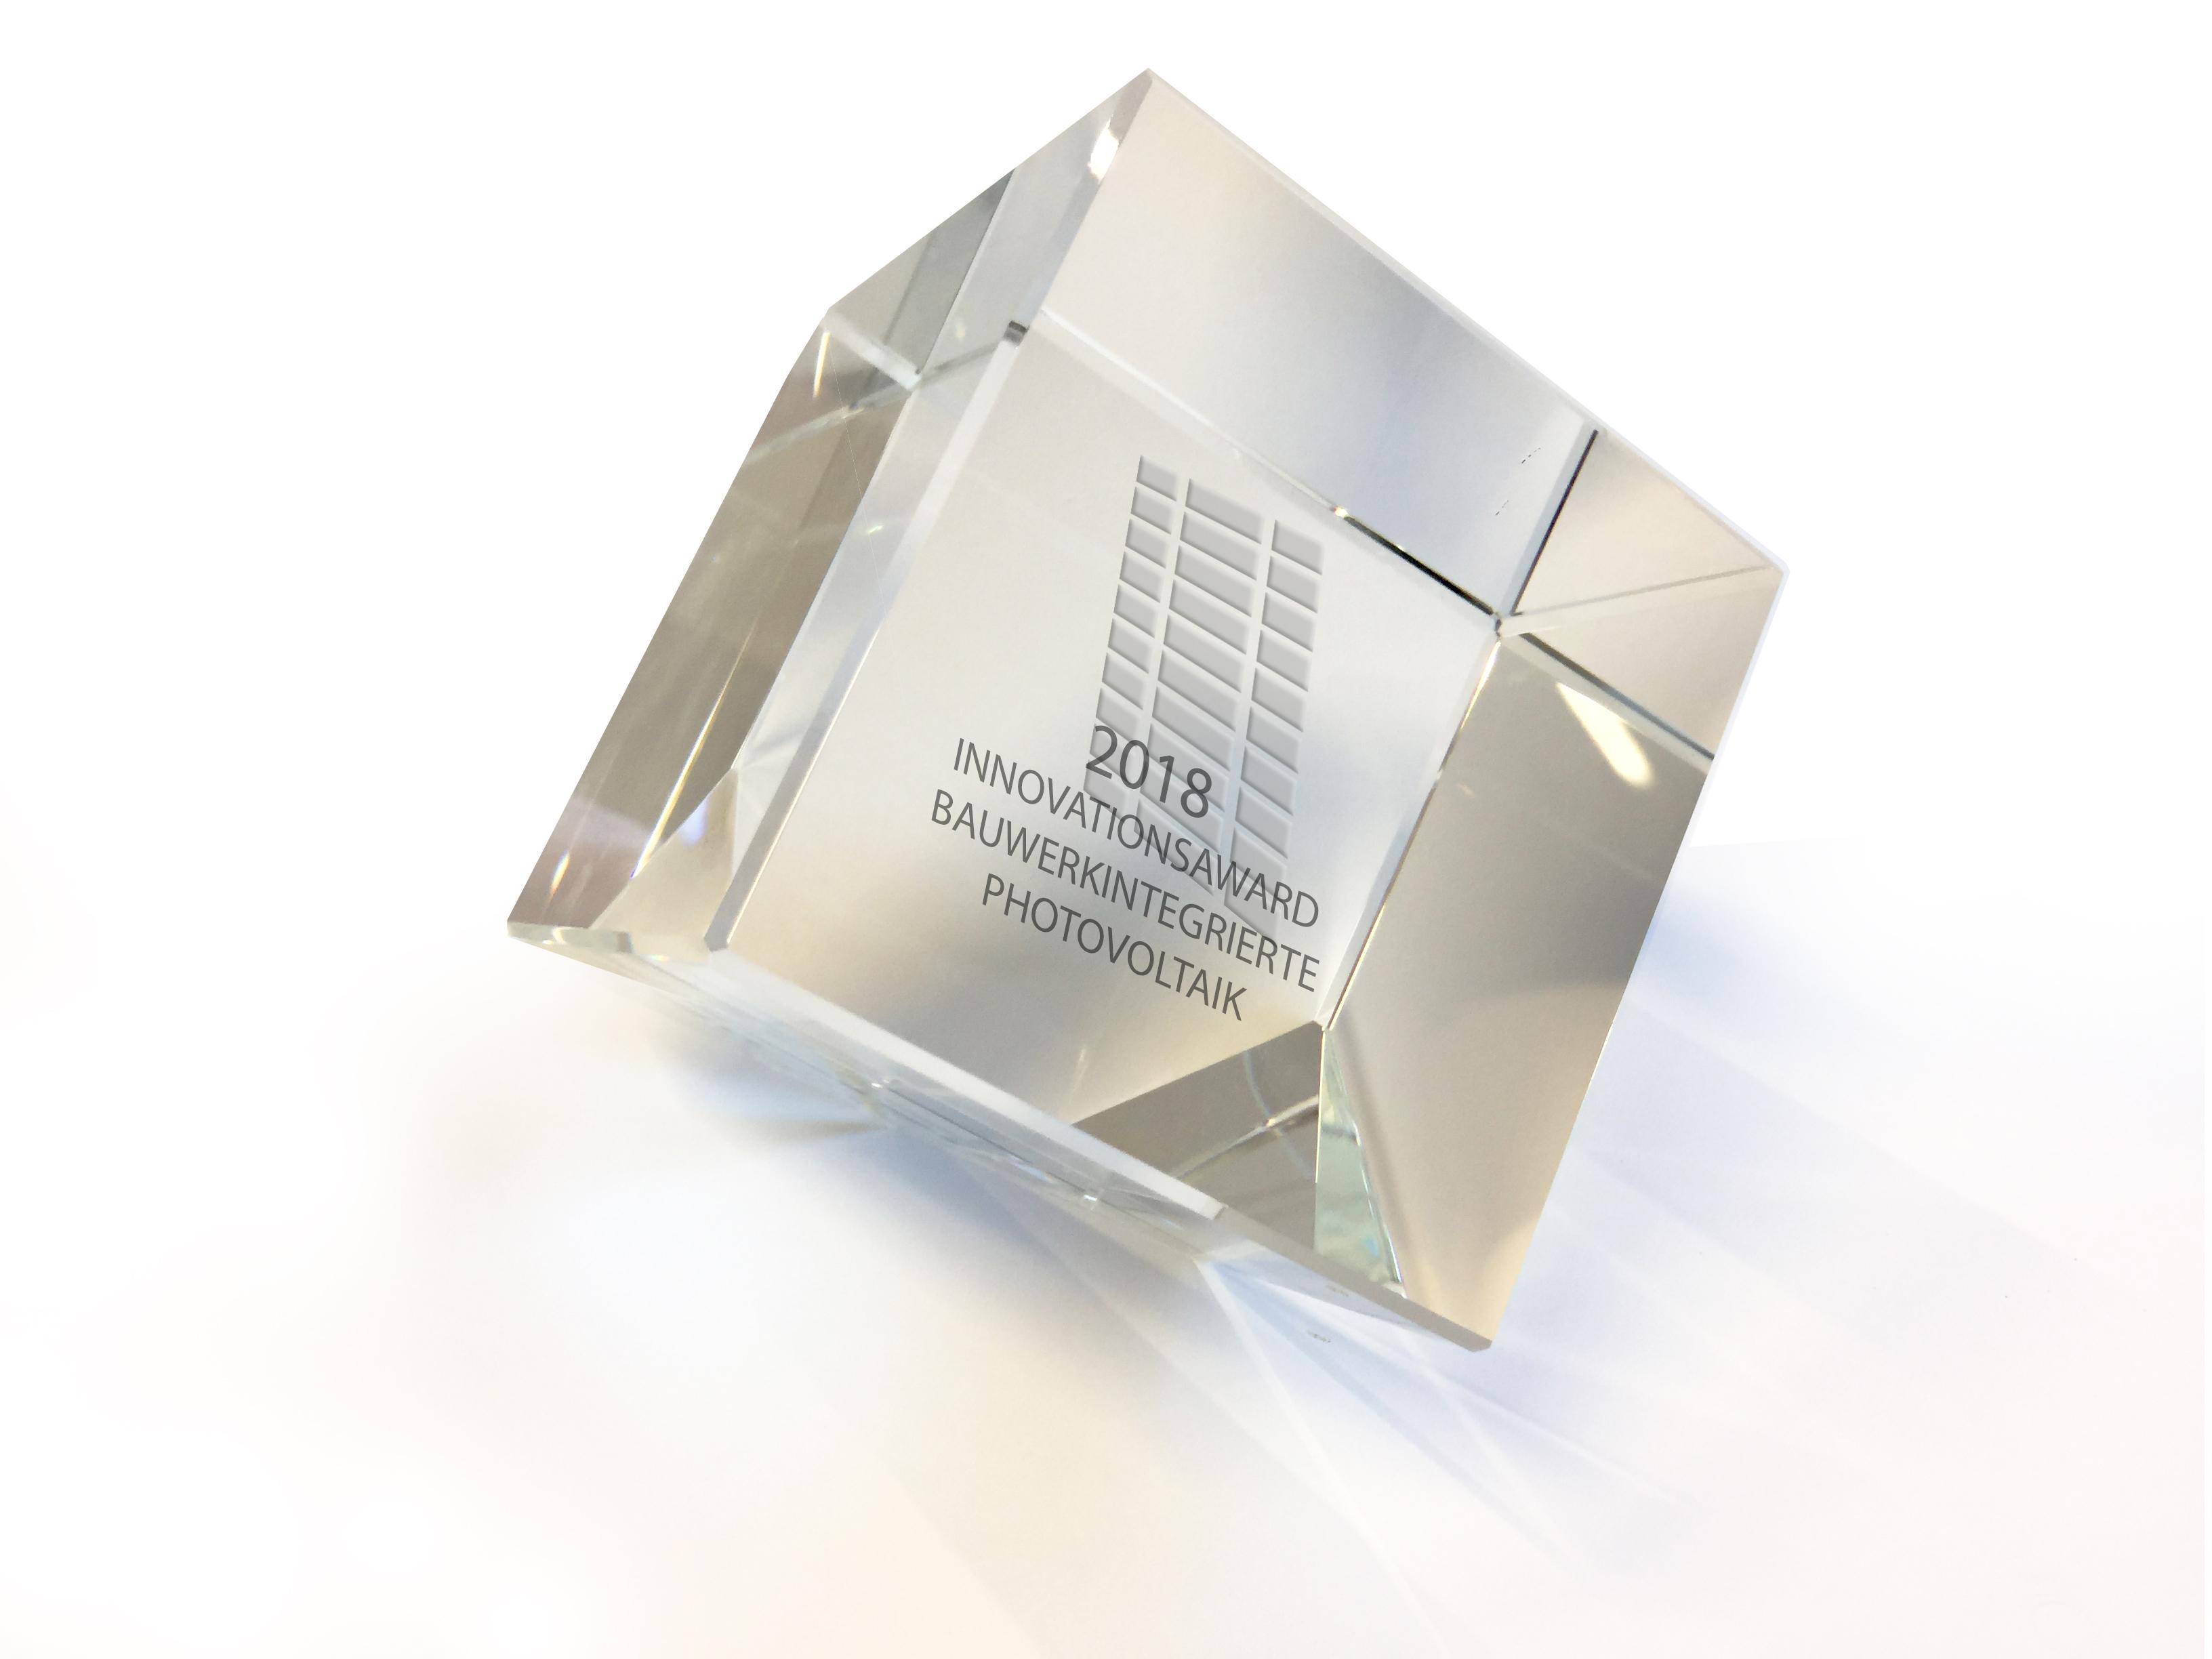 BIPV Award %C2%A9TPPV | Photovoltaik Österreich